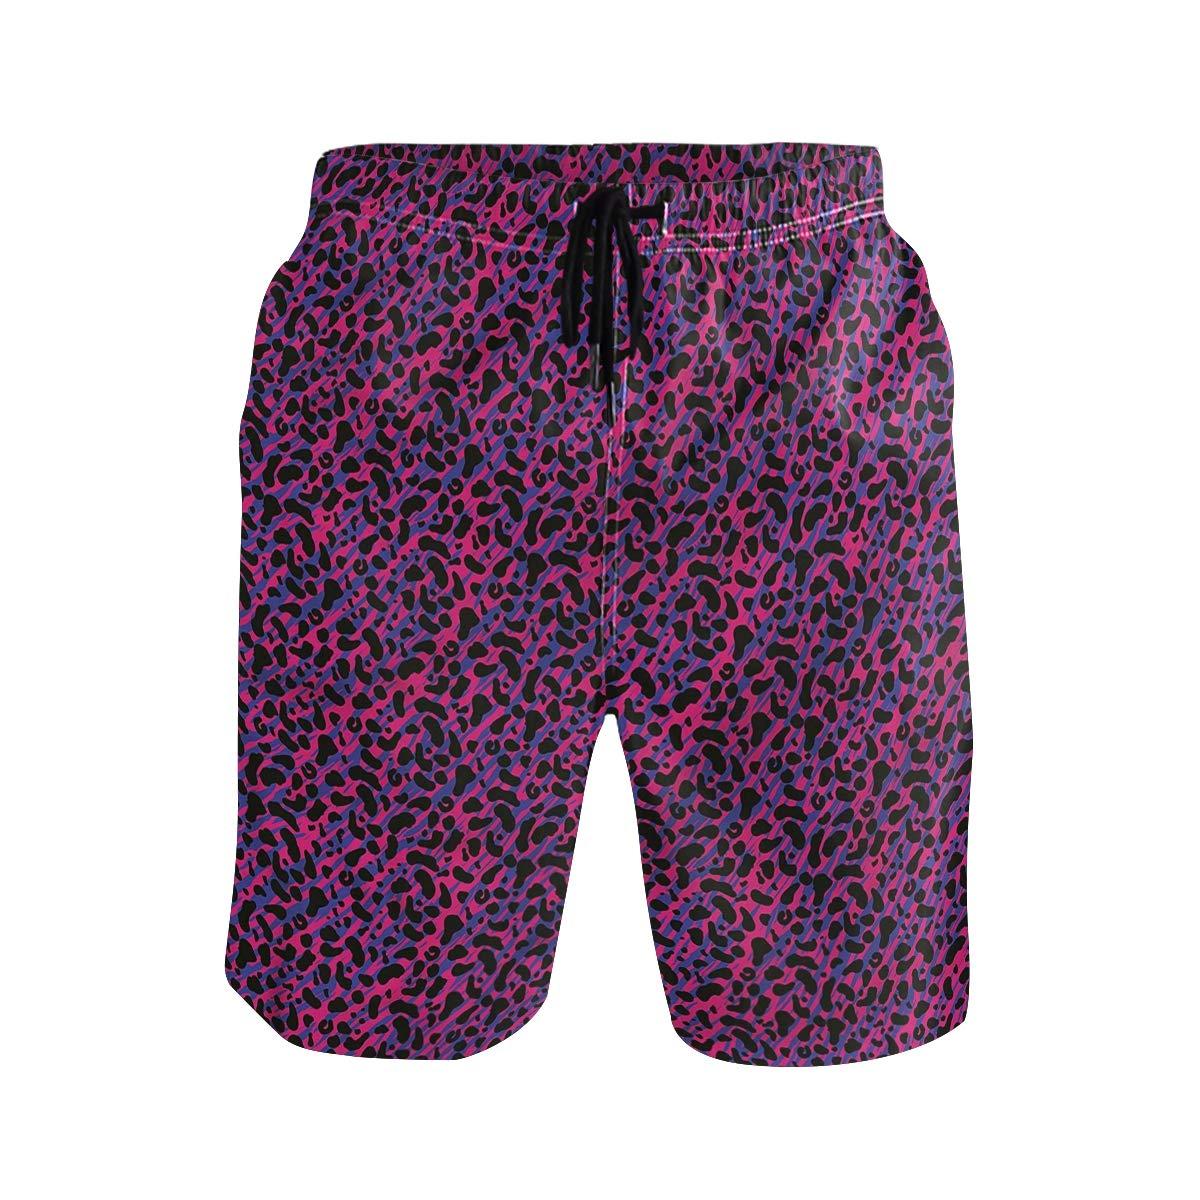 COVASA Mens Summer ShortsLeopard Skin Safari 80S